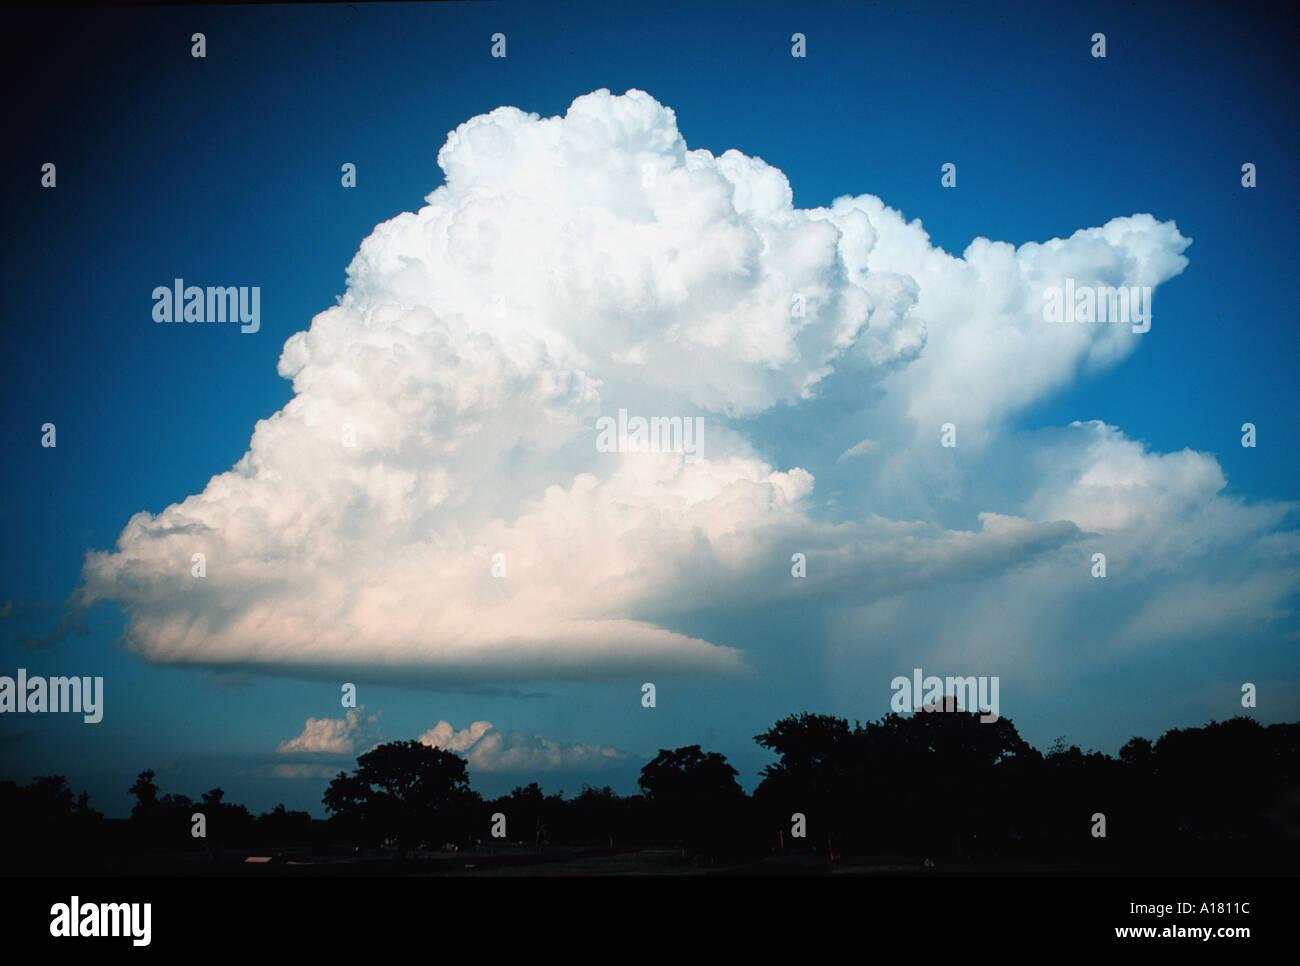 thunderhead clouds wallpaper - photo #24